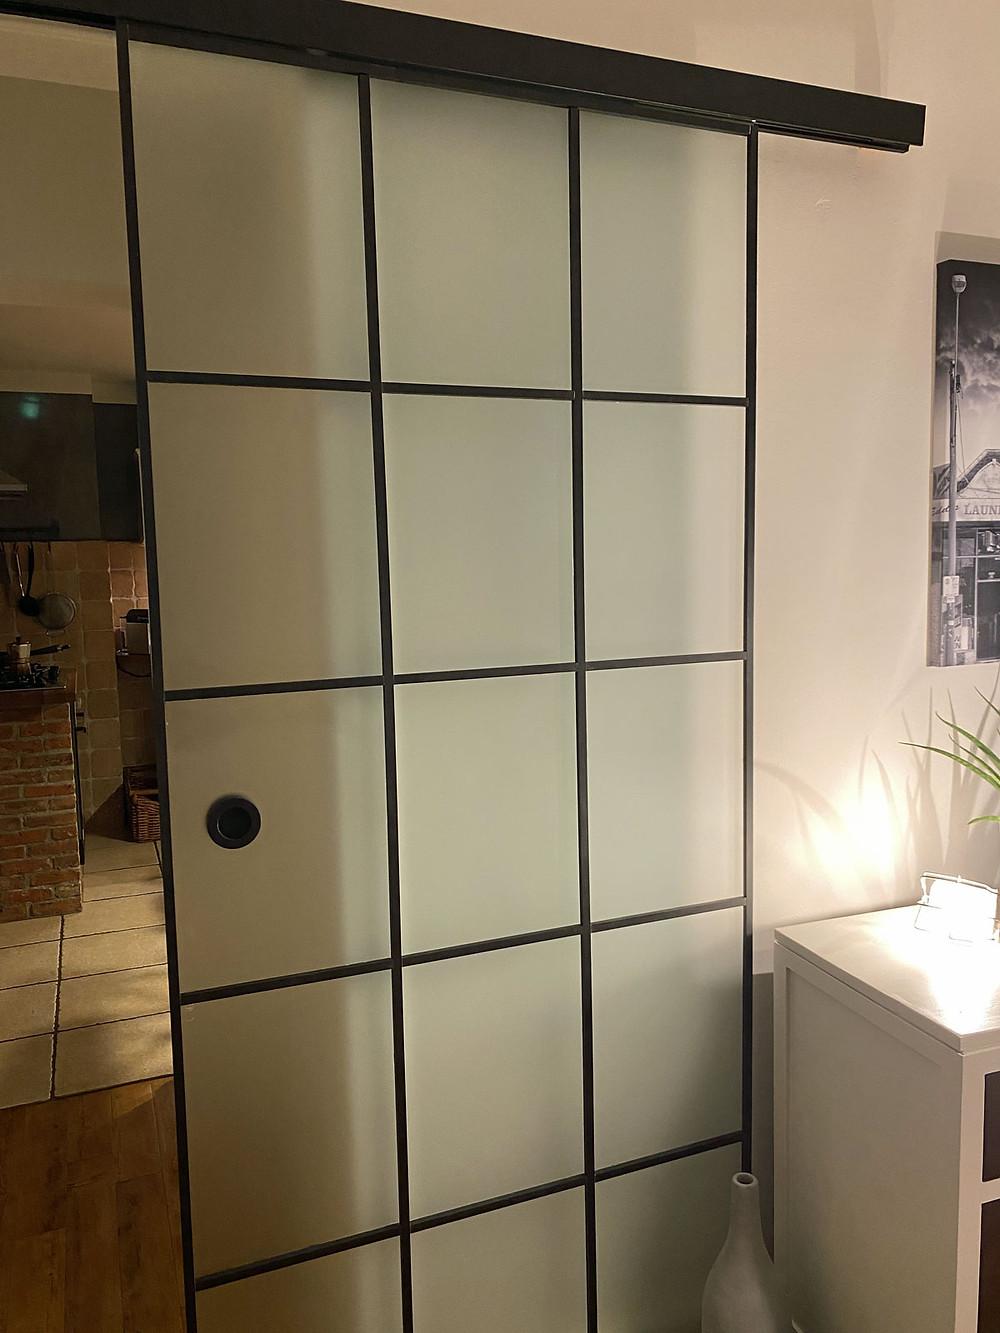 Glastür Upcycling mit Holz DIY Crittall Tür Sprossentür